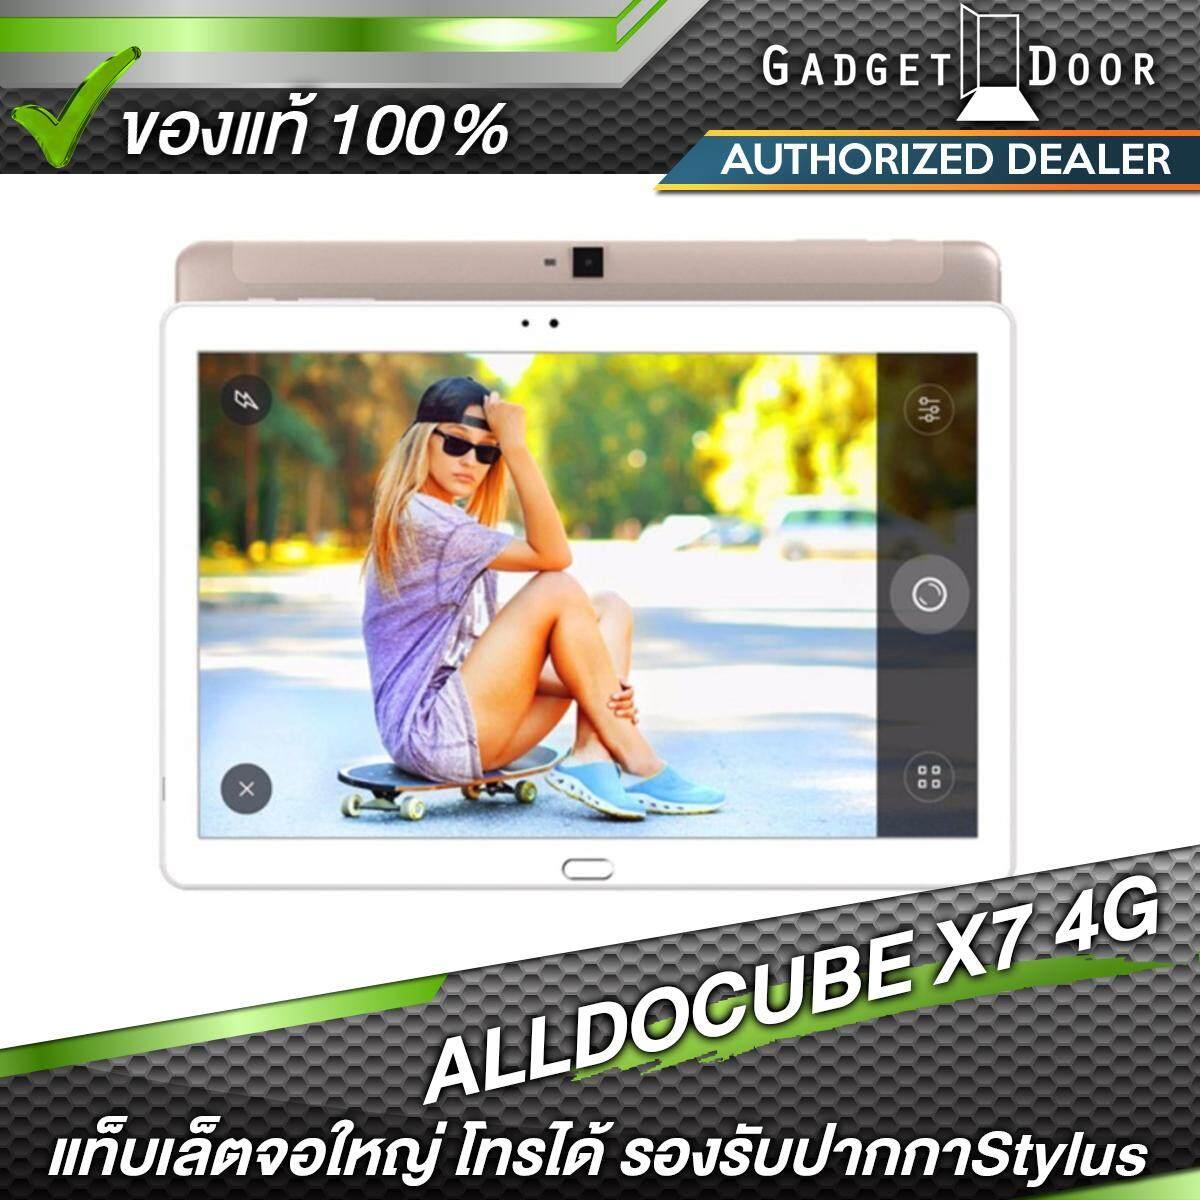 ALLDOCUBE / Cube X7 4G Tablet 10.1 Full HD MTK8783 Octa Core Android 6.0 3GB/32GB (Gold)